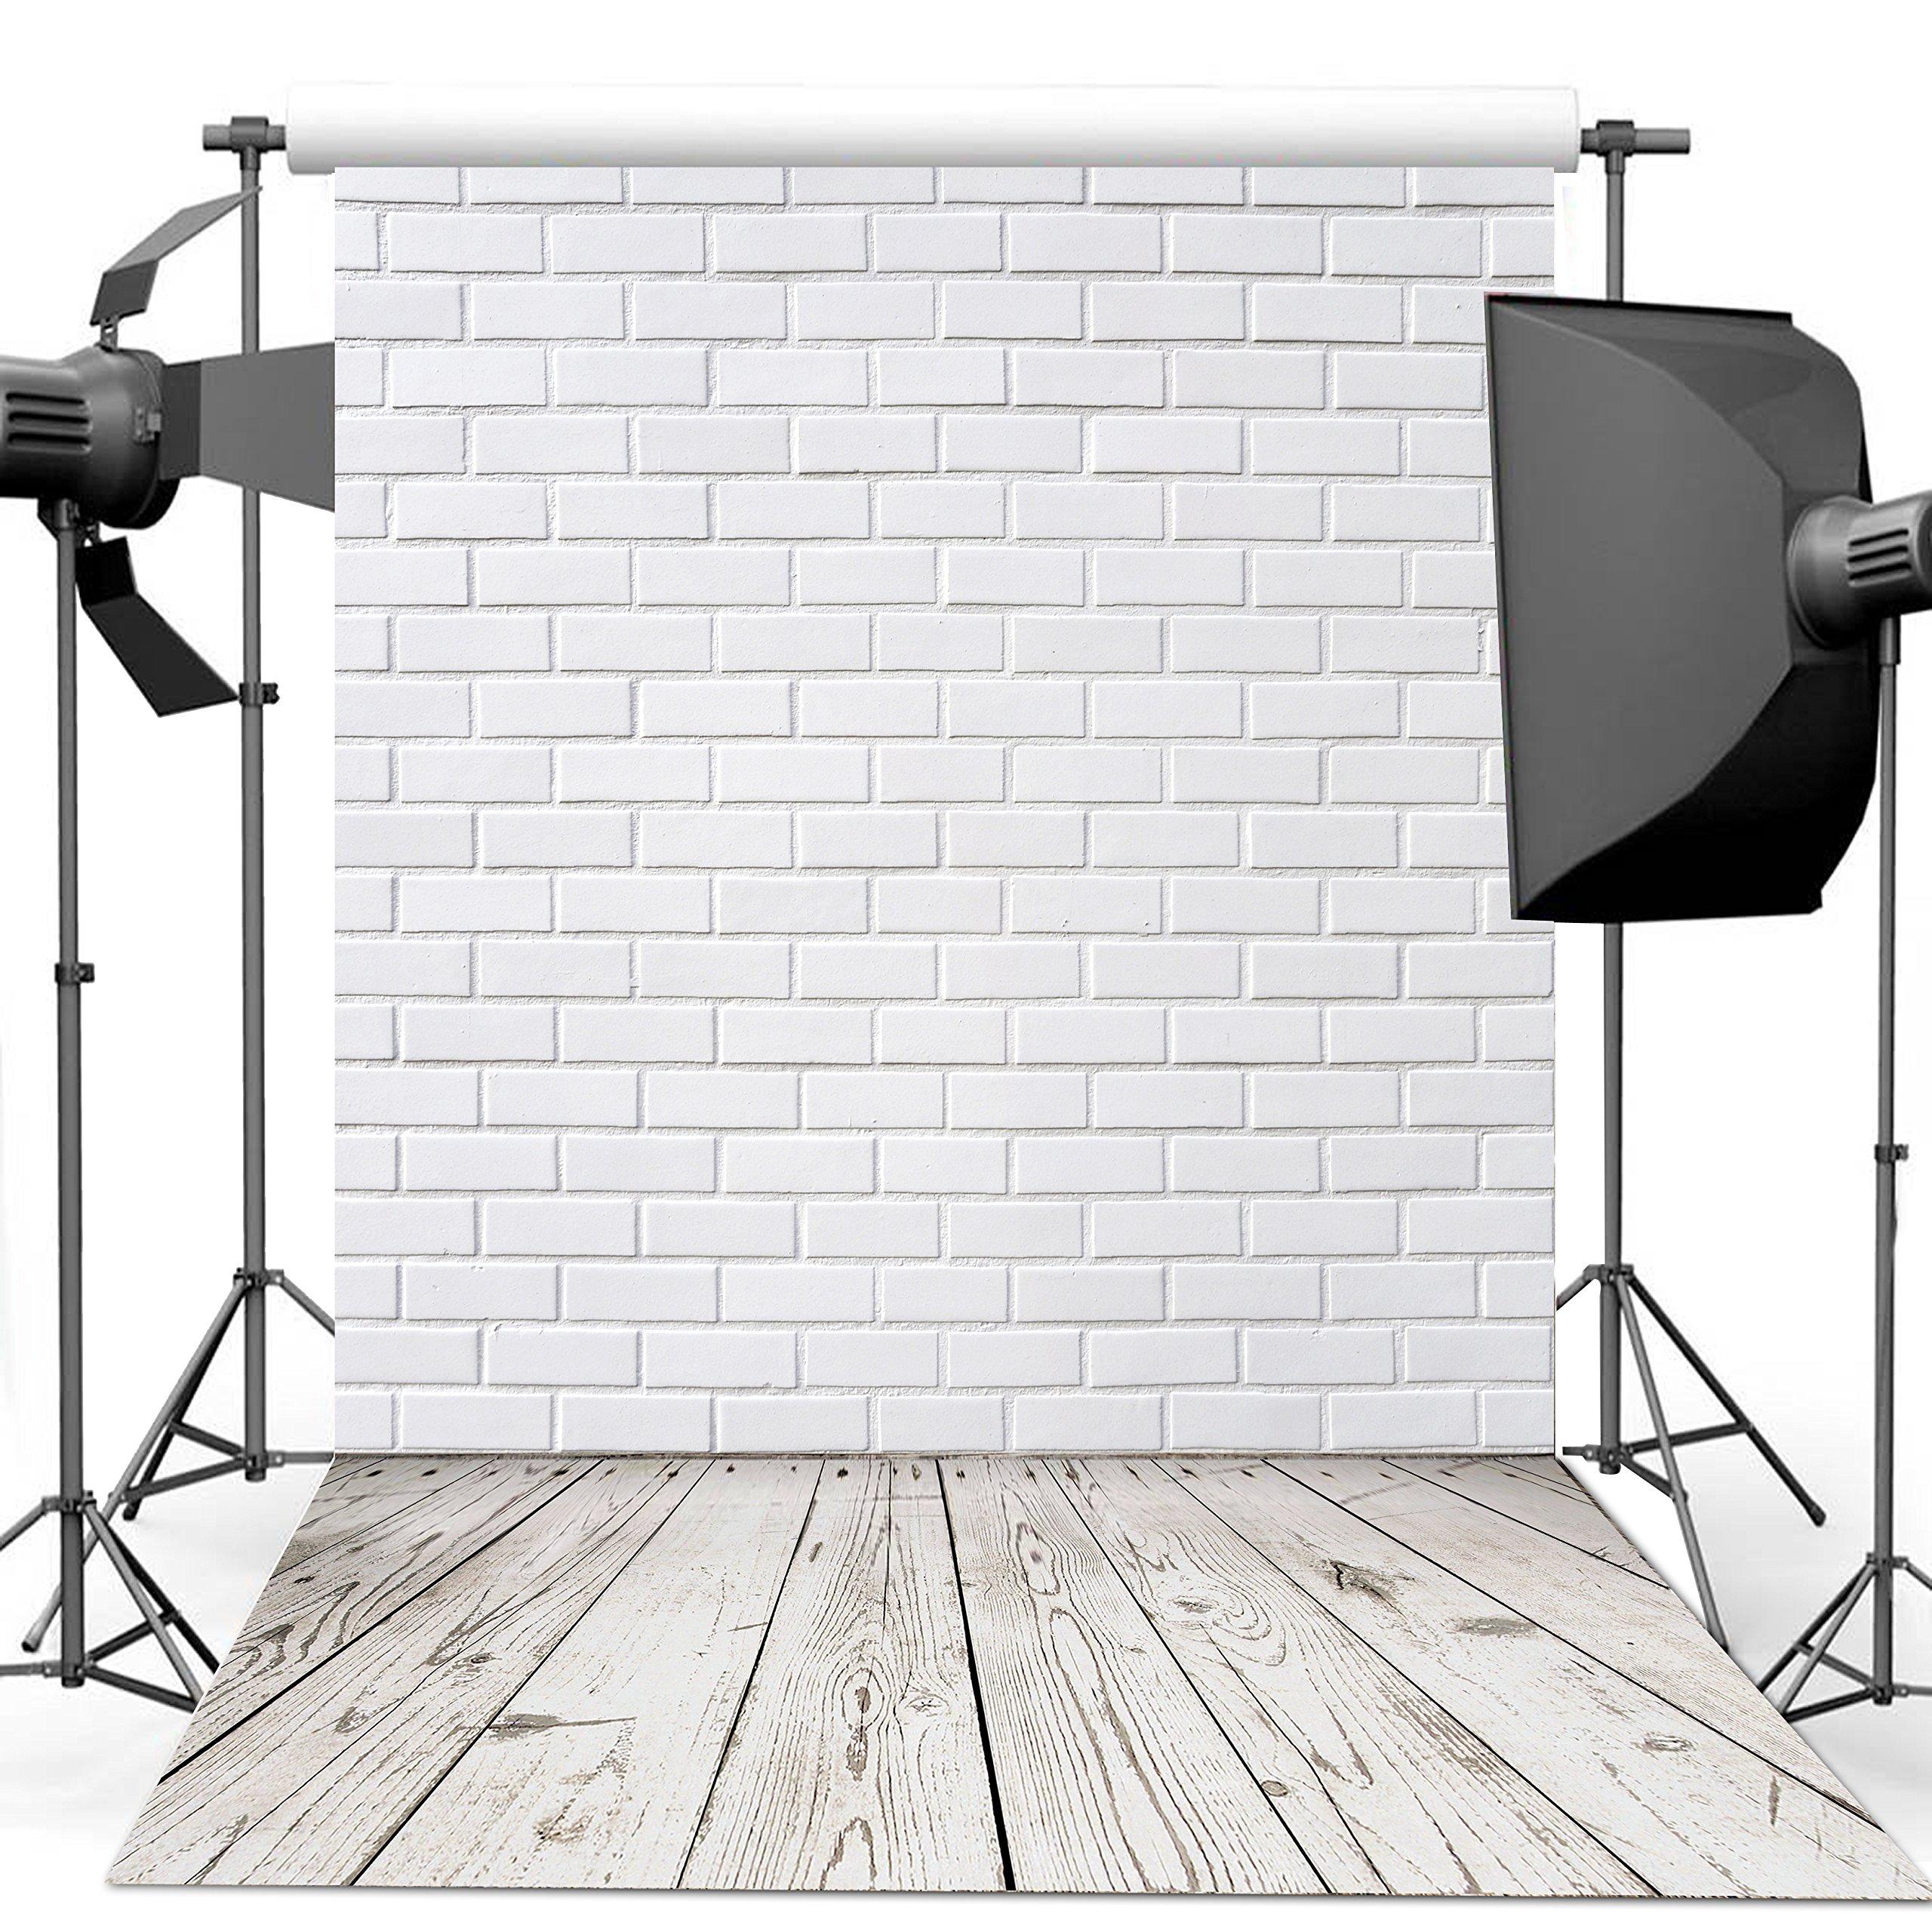 Dudaacvt 10x10ft Vinyl Photography Background White Brick Wall Wood Floor Theme Backdrops Photo Studio Backdrop Props MQ0061010